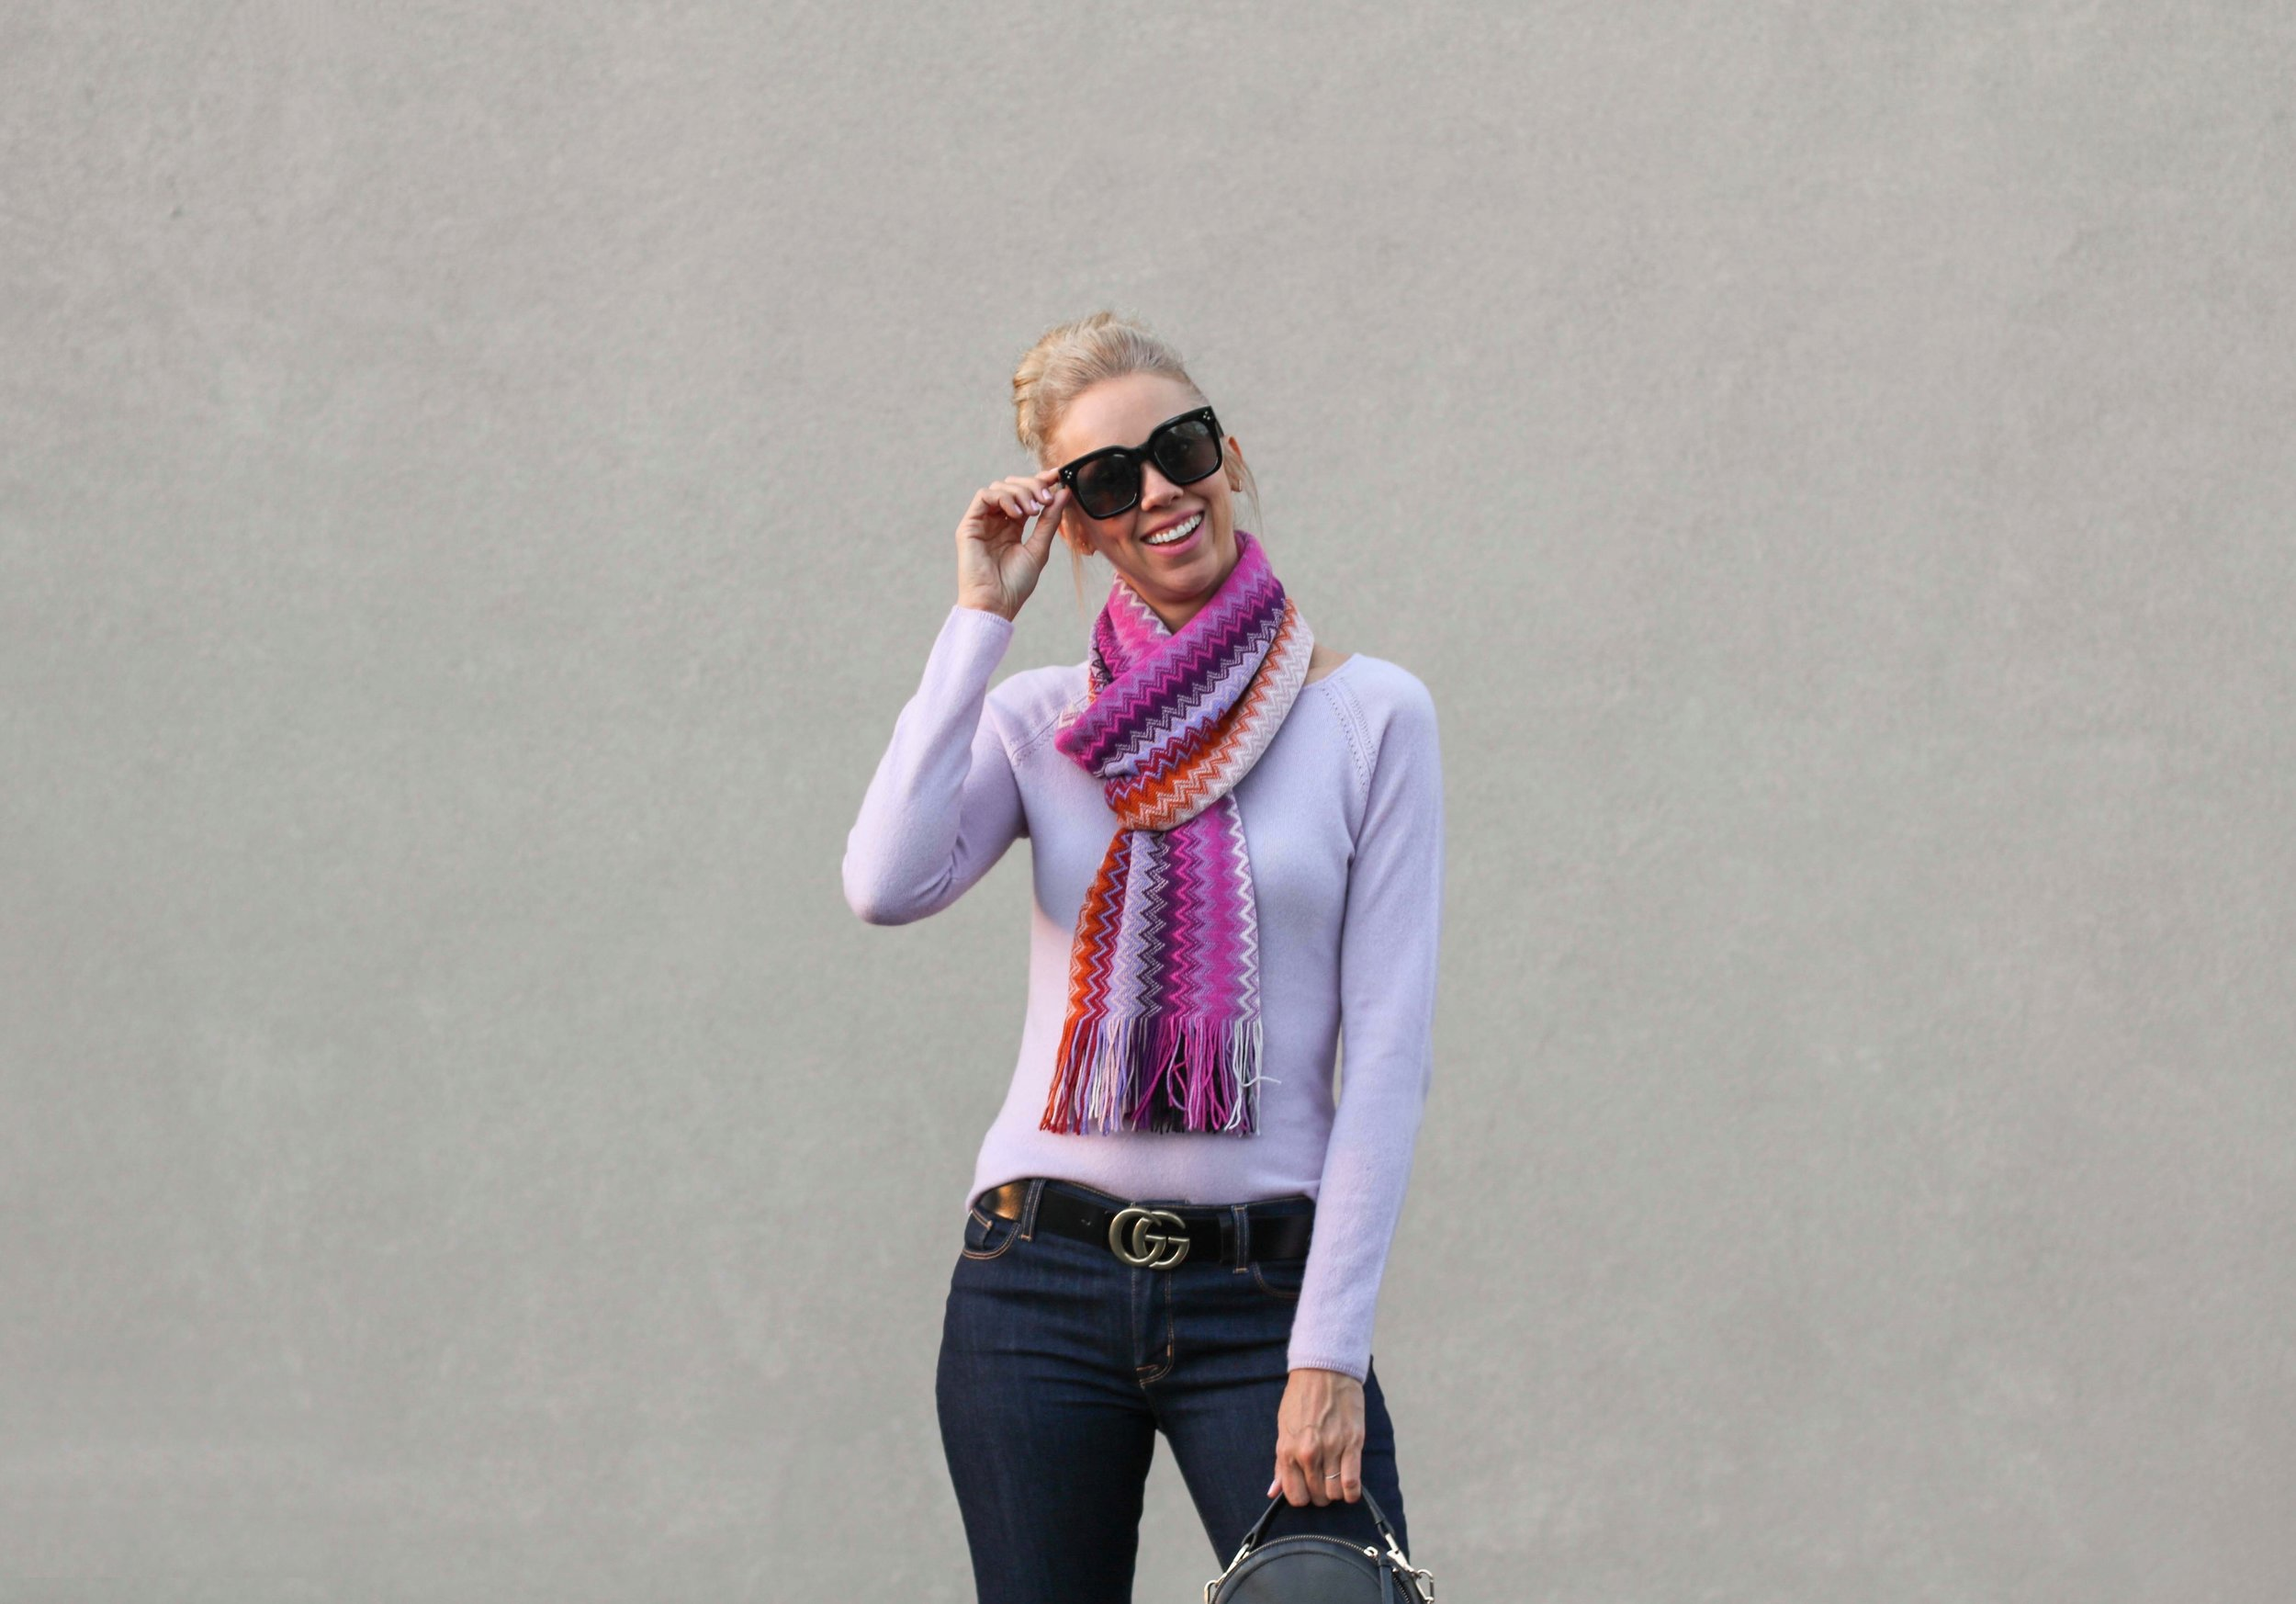 missoni-chevron-scarf-purple-cashmere-sweater-celine-sunglasses-street-style-fashion.jpg